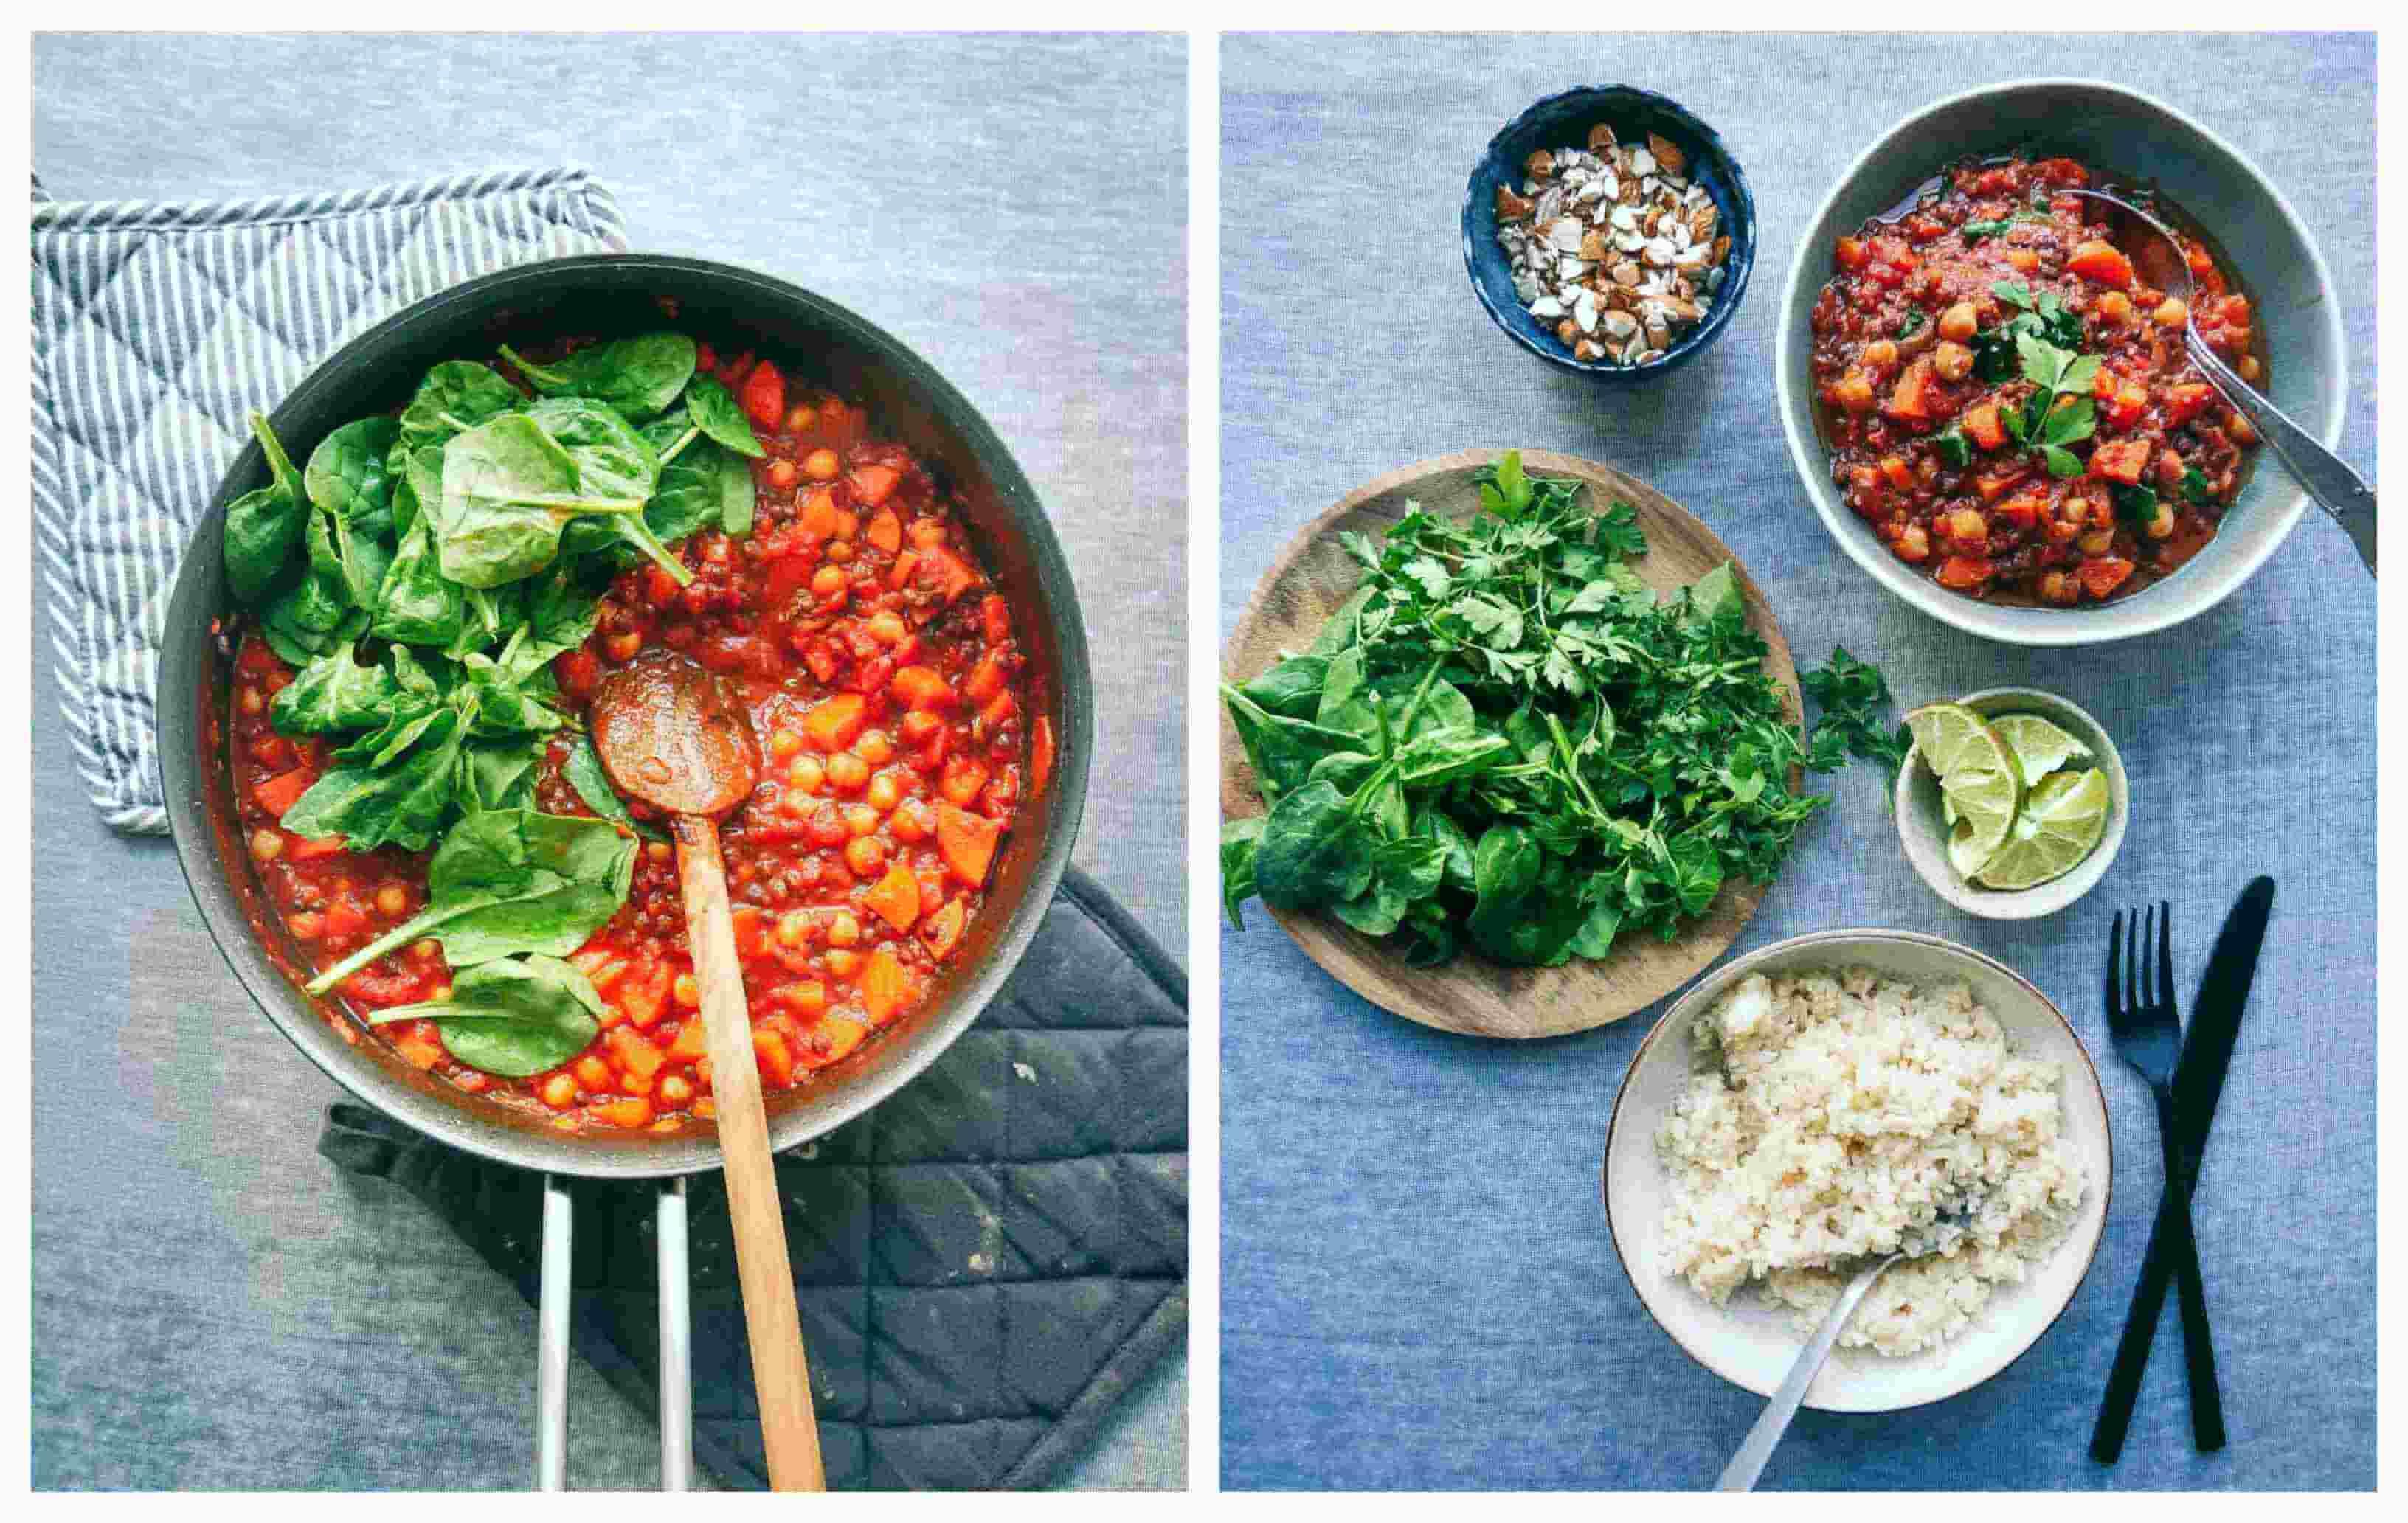 Moroccan stew ingredients